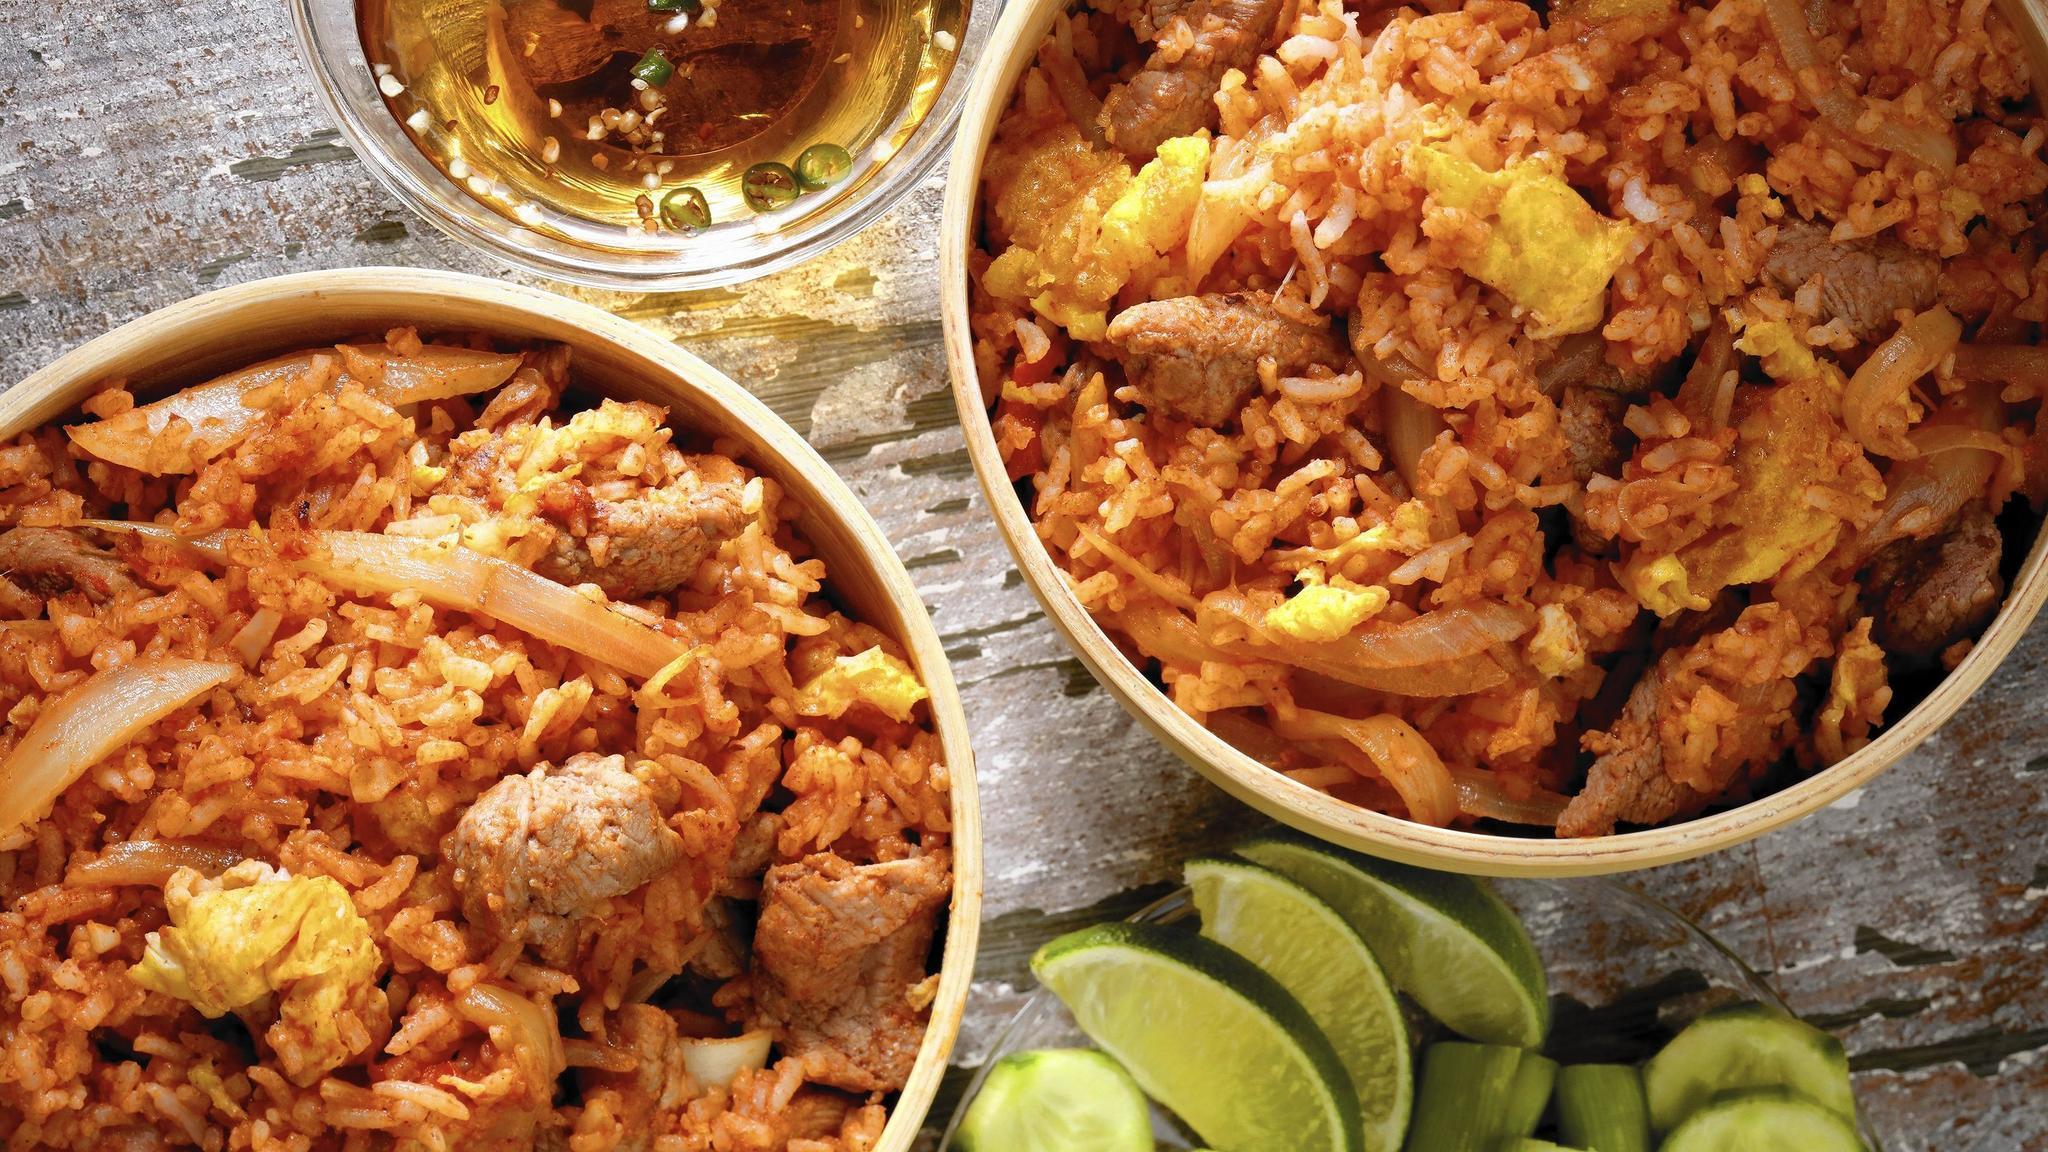 39 bangkok 39 cookbook avoids cliches digs deep into city 39 s for Cuisine bangkok